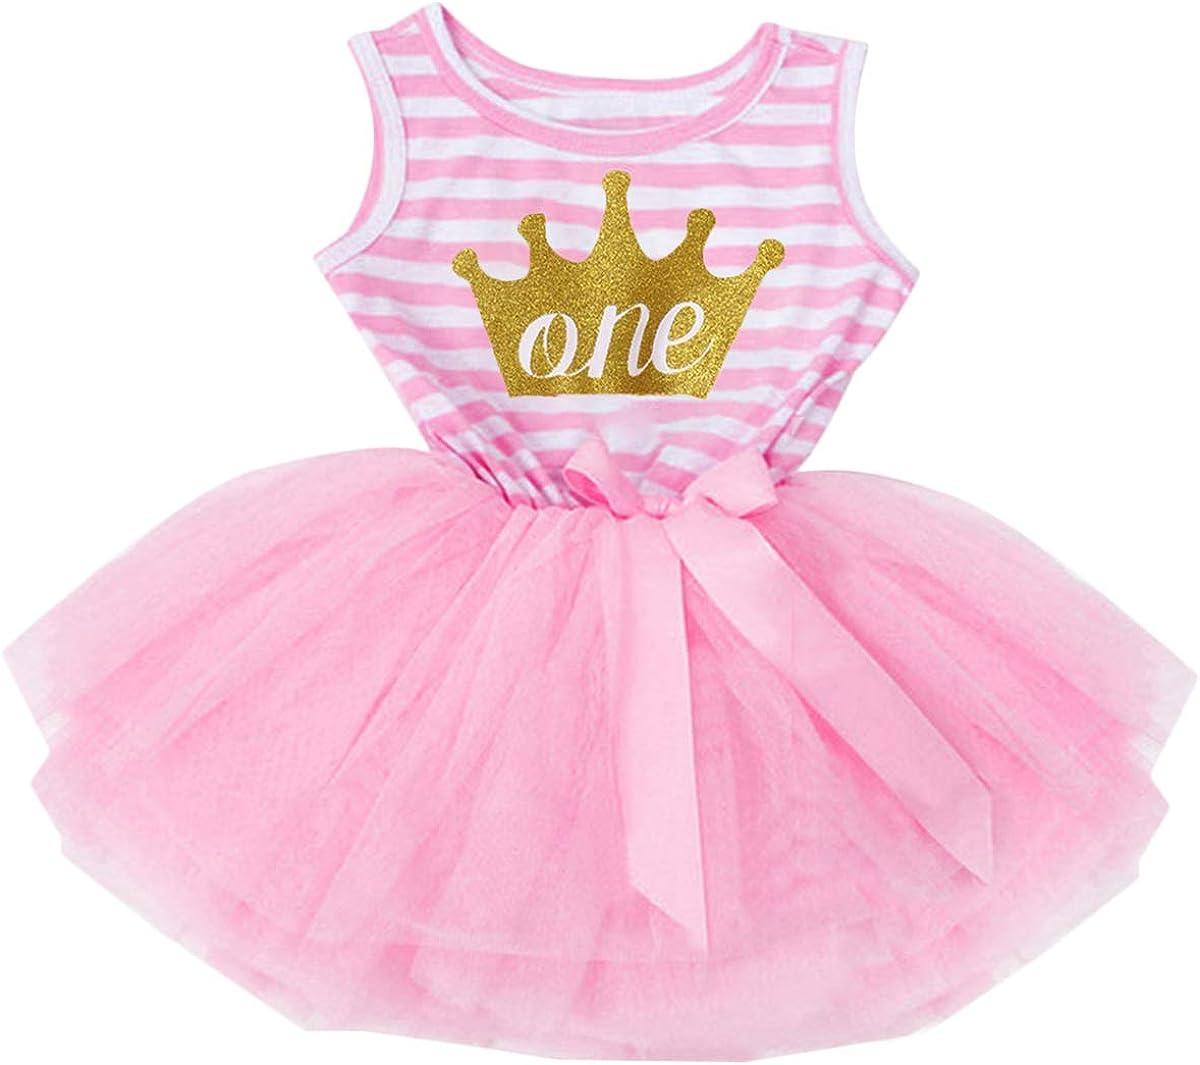 MYRISAM Princess Baby Girls 1st 5 popular 2nd Birthday Dress Rare Slee Tutu 3rd